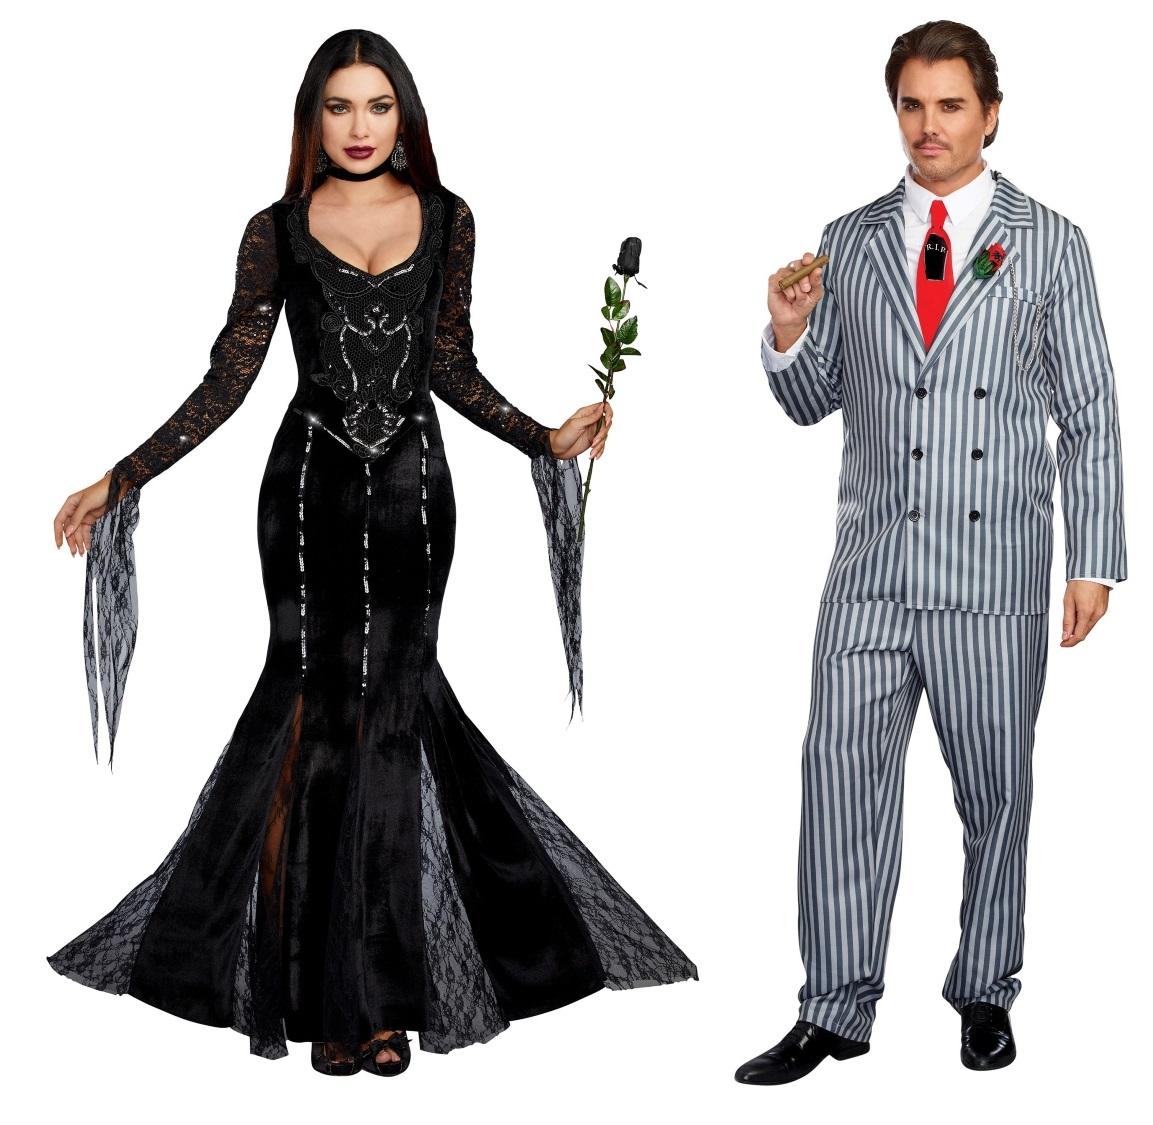 Morticia and Gomez Addams Couples Costumes